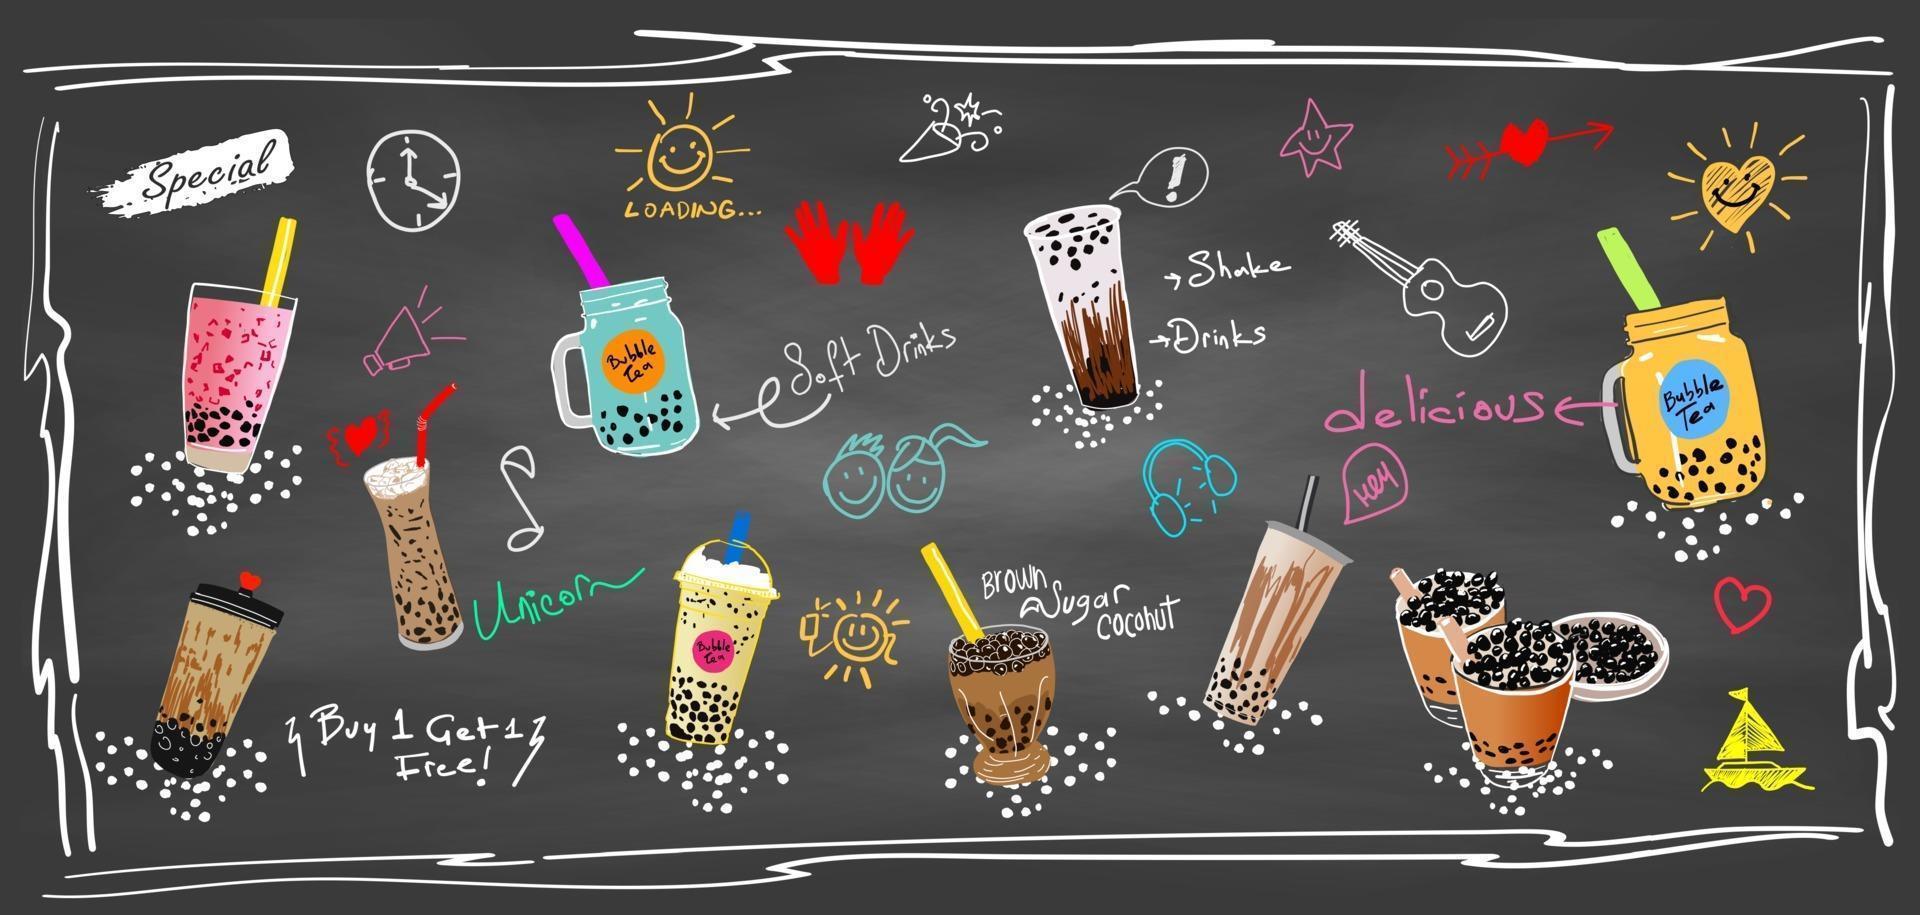 bubbelmjölkte, pärlemjölkte, olika sorters boba. smaskiga drycker. vektor